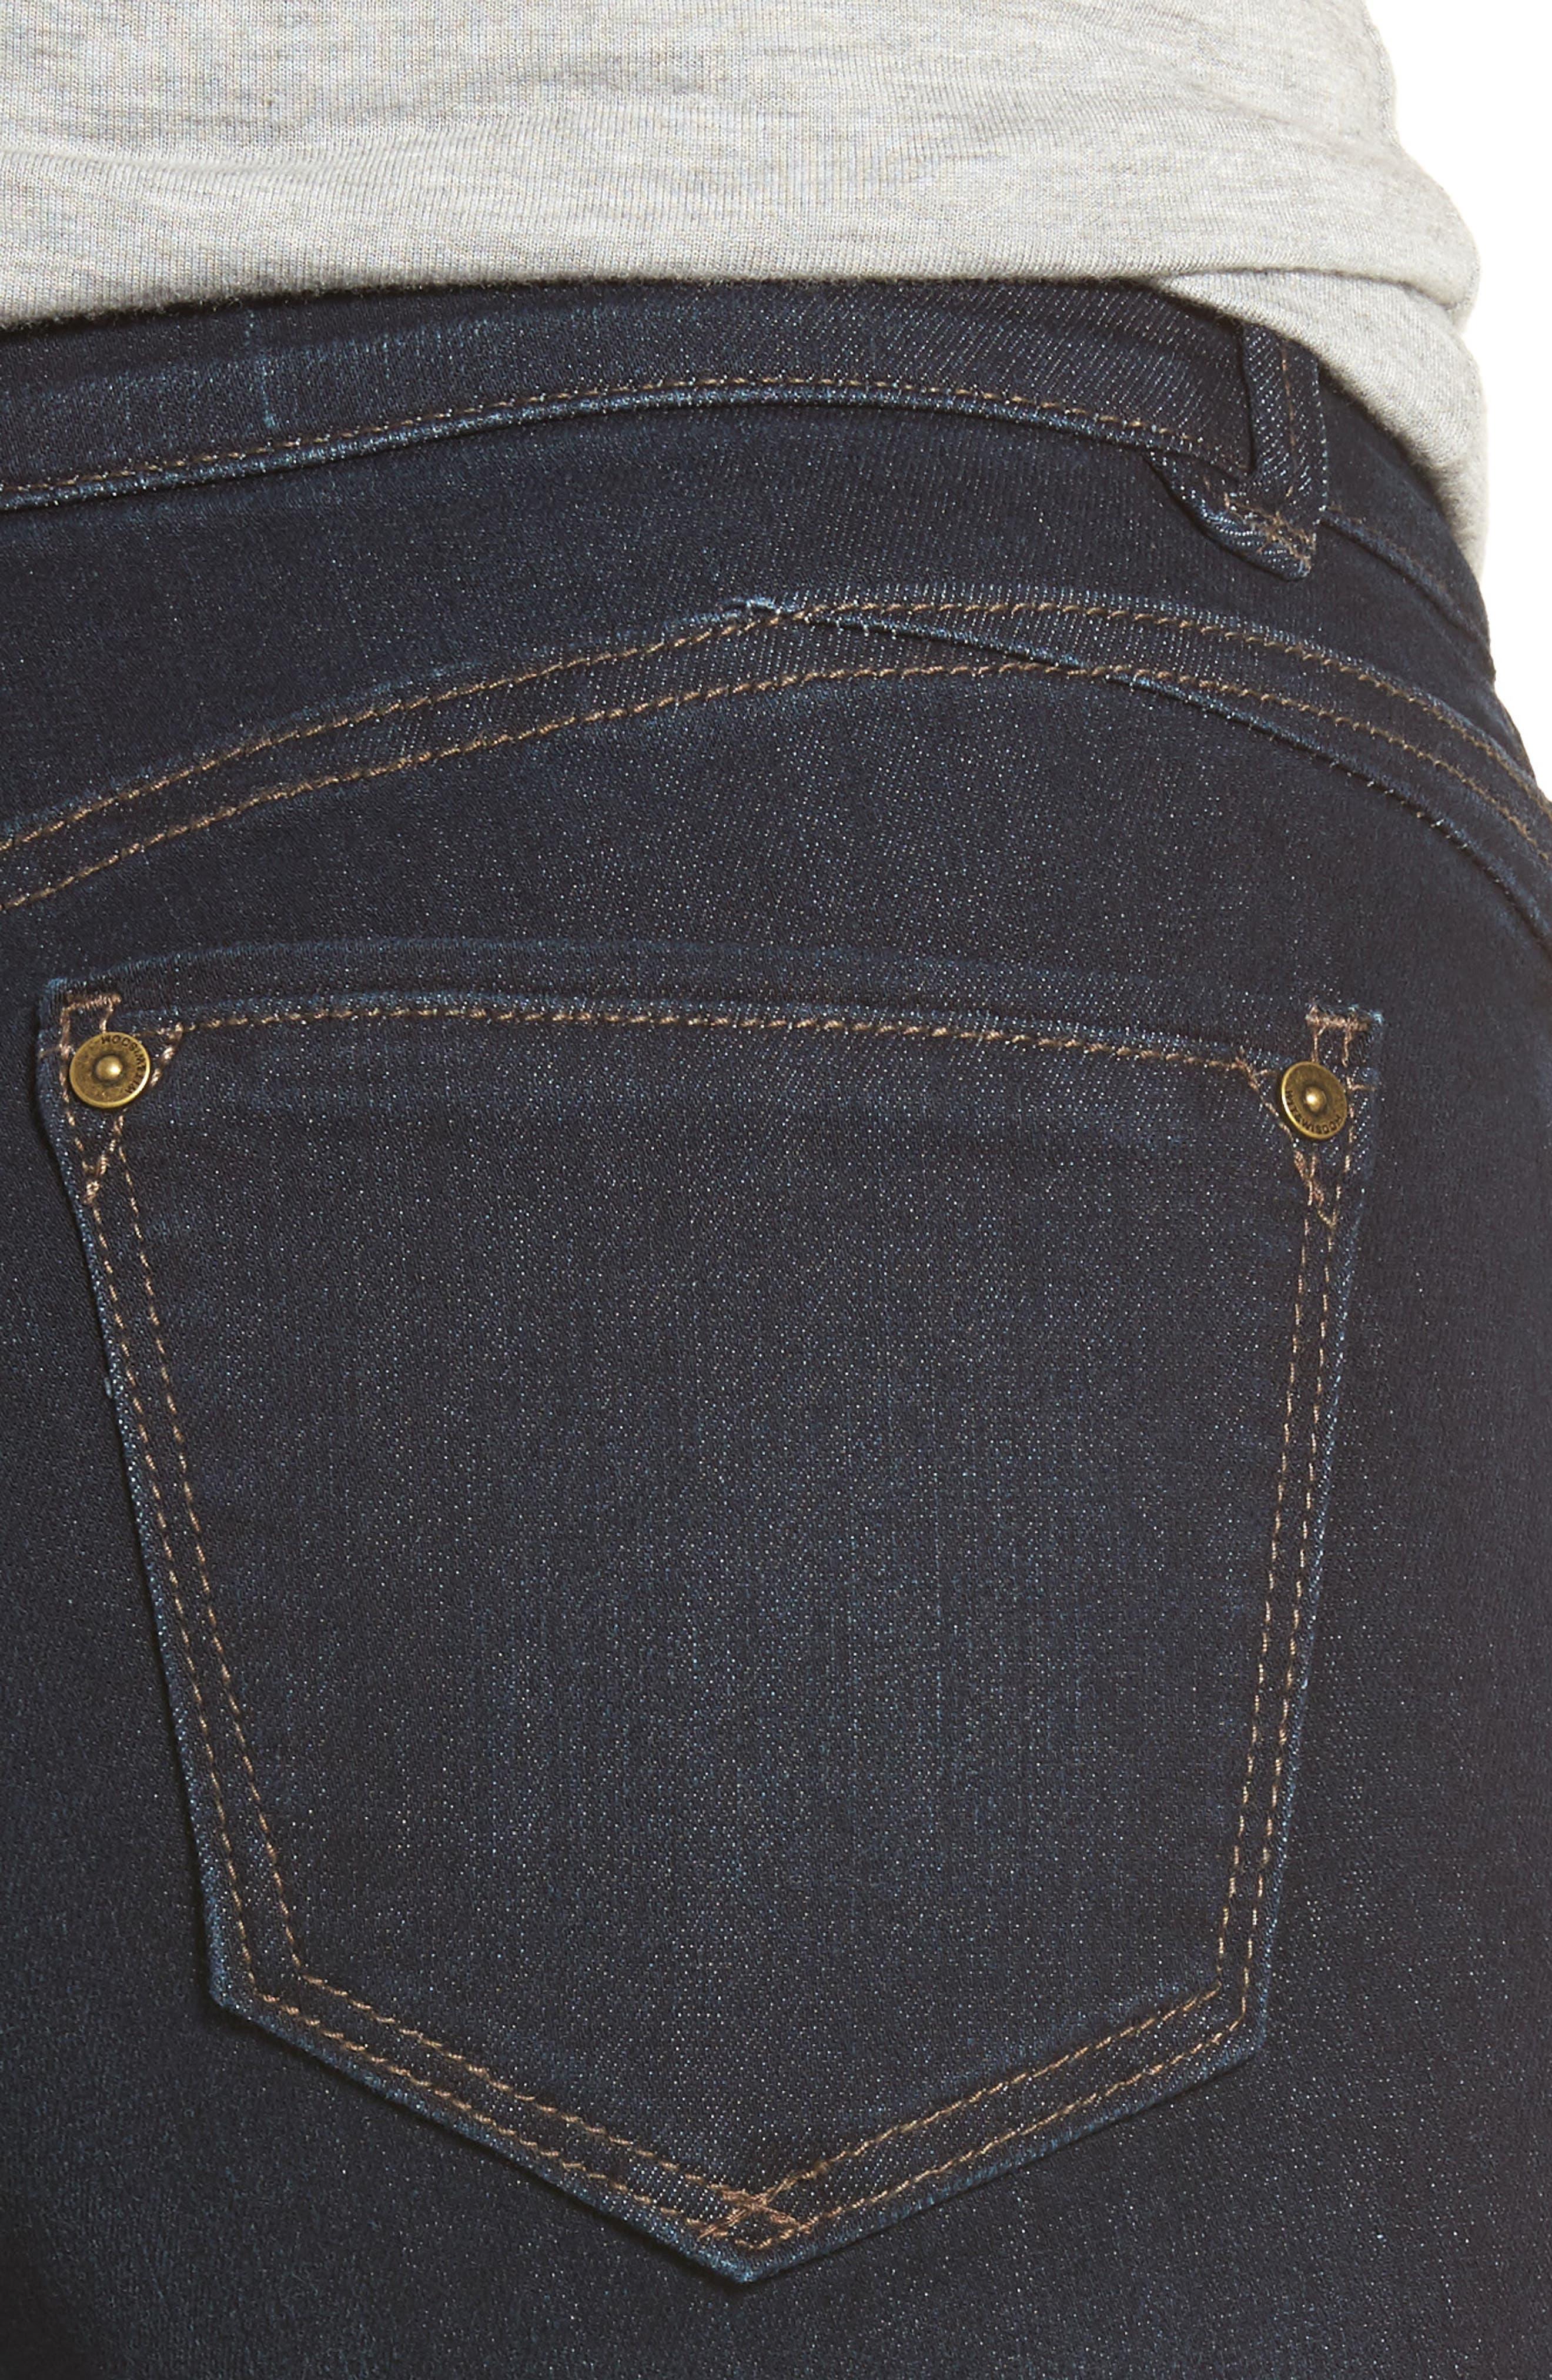 Alternate Image 4  - Wit & Wisdom Ab-solution Straight Leg Jeans (Regular & Petite) (Nordstrom Exclusive)